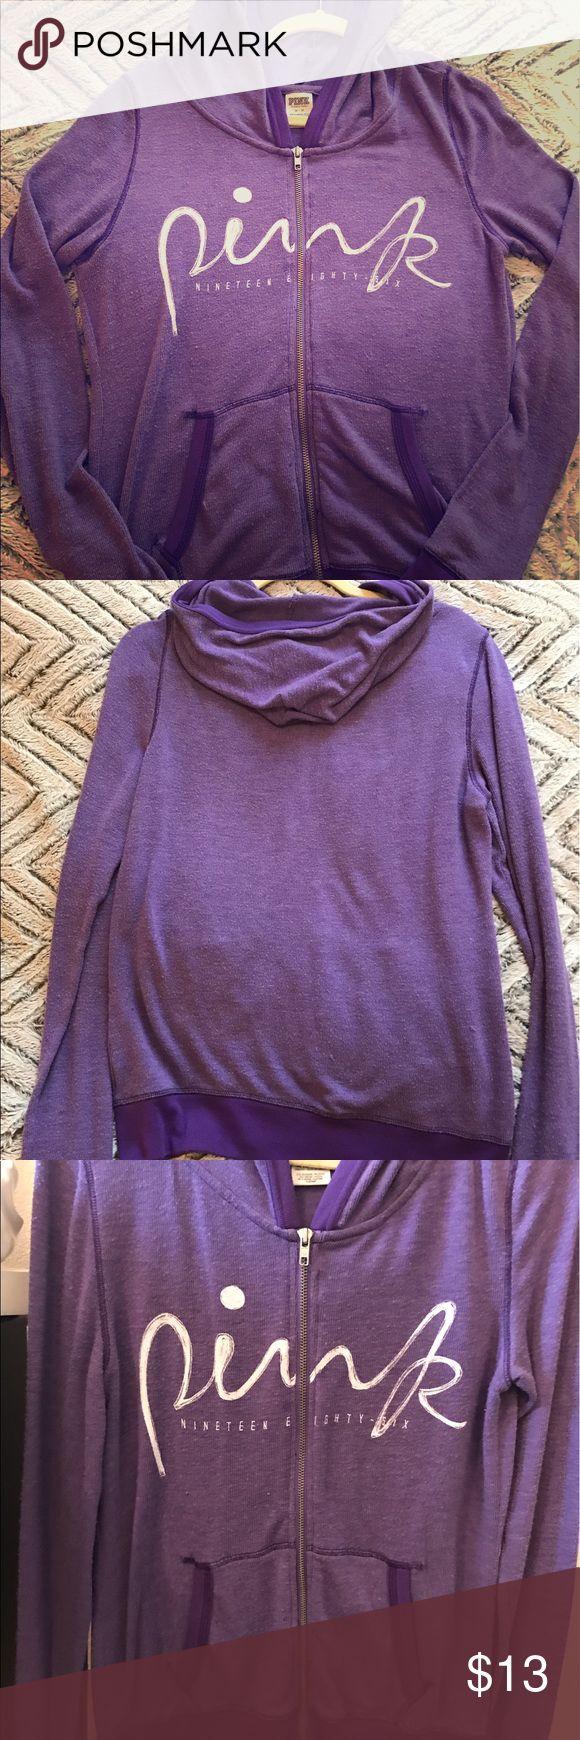 Used - Victoria Secret Pink zip-up thin hoodie Purple VS Pink zip up, thin hoodie. 61% polyester, 35% viscose 4% elastane. Size medium PINK Victoria's Secret Sweaters